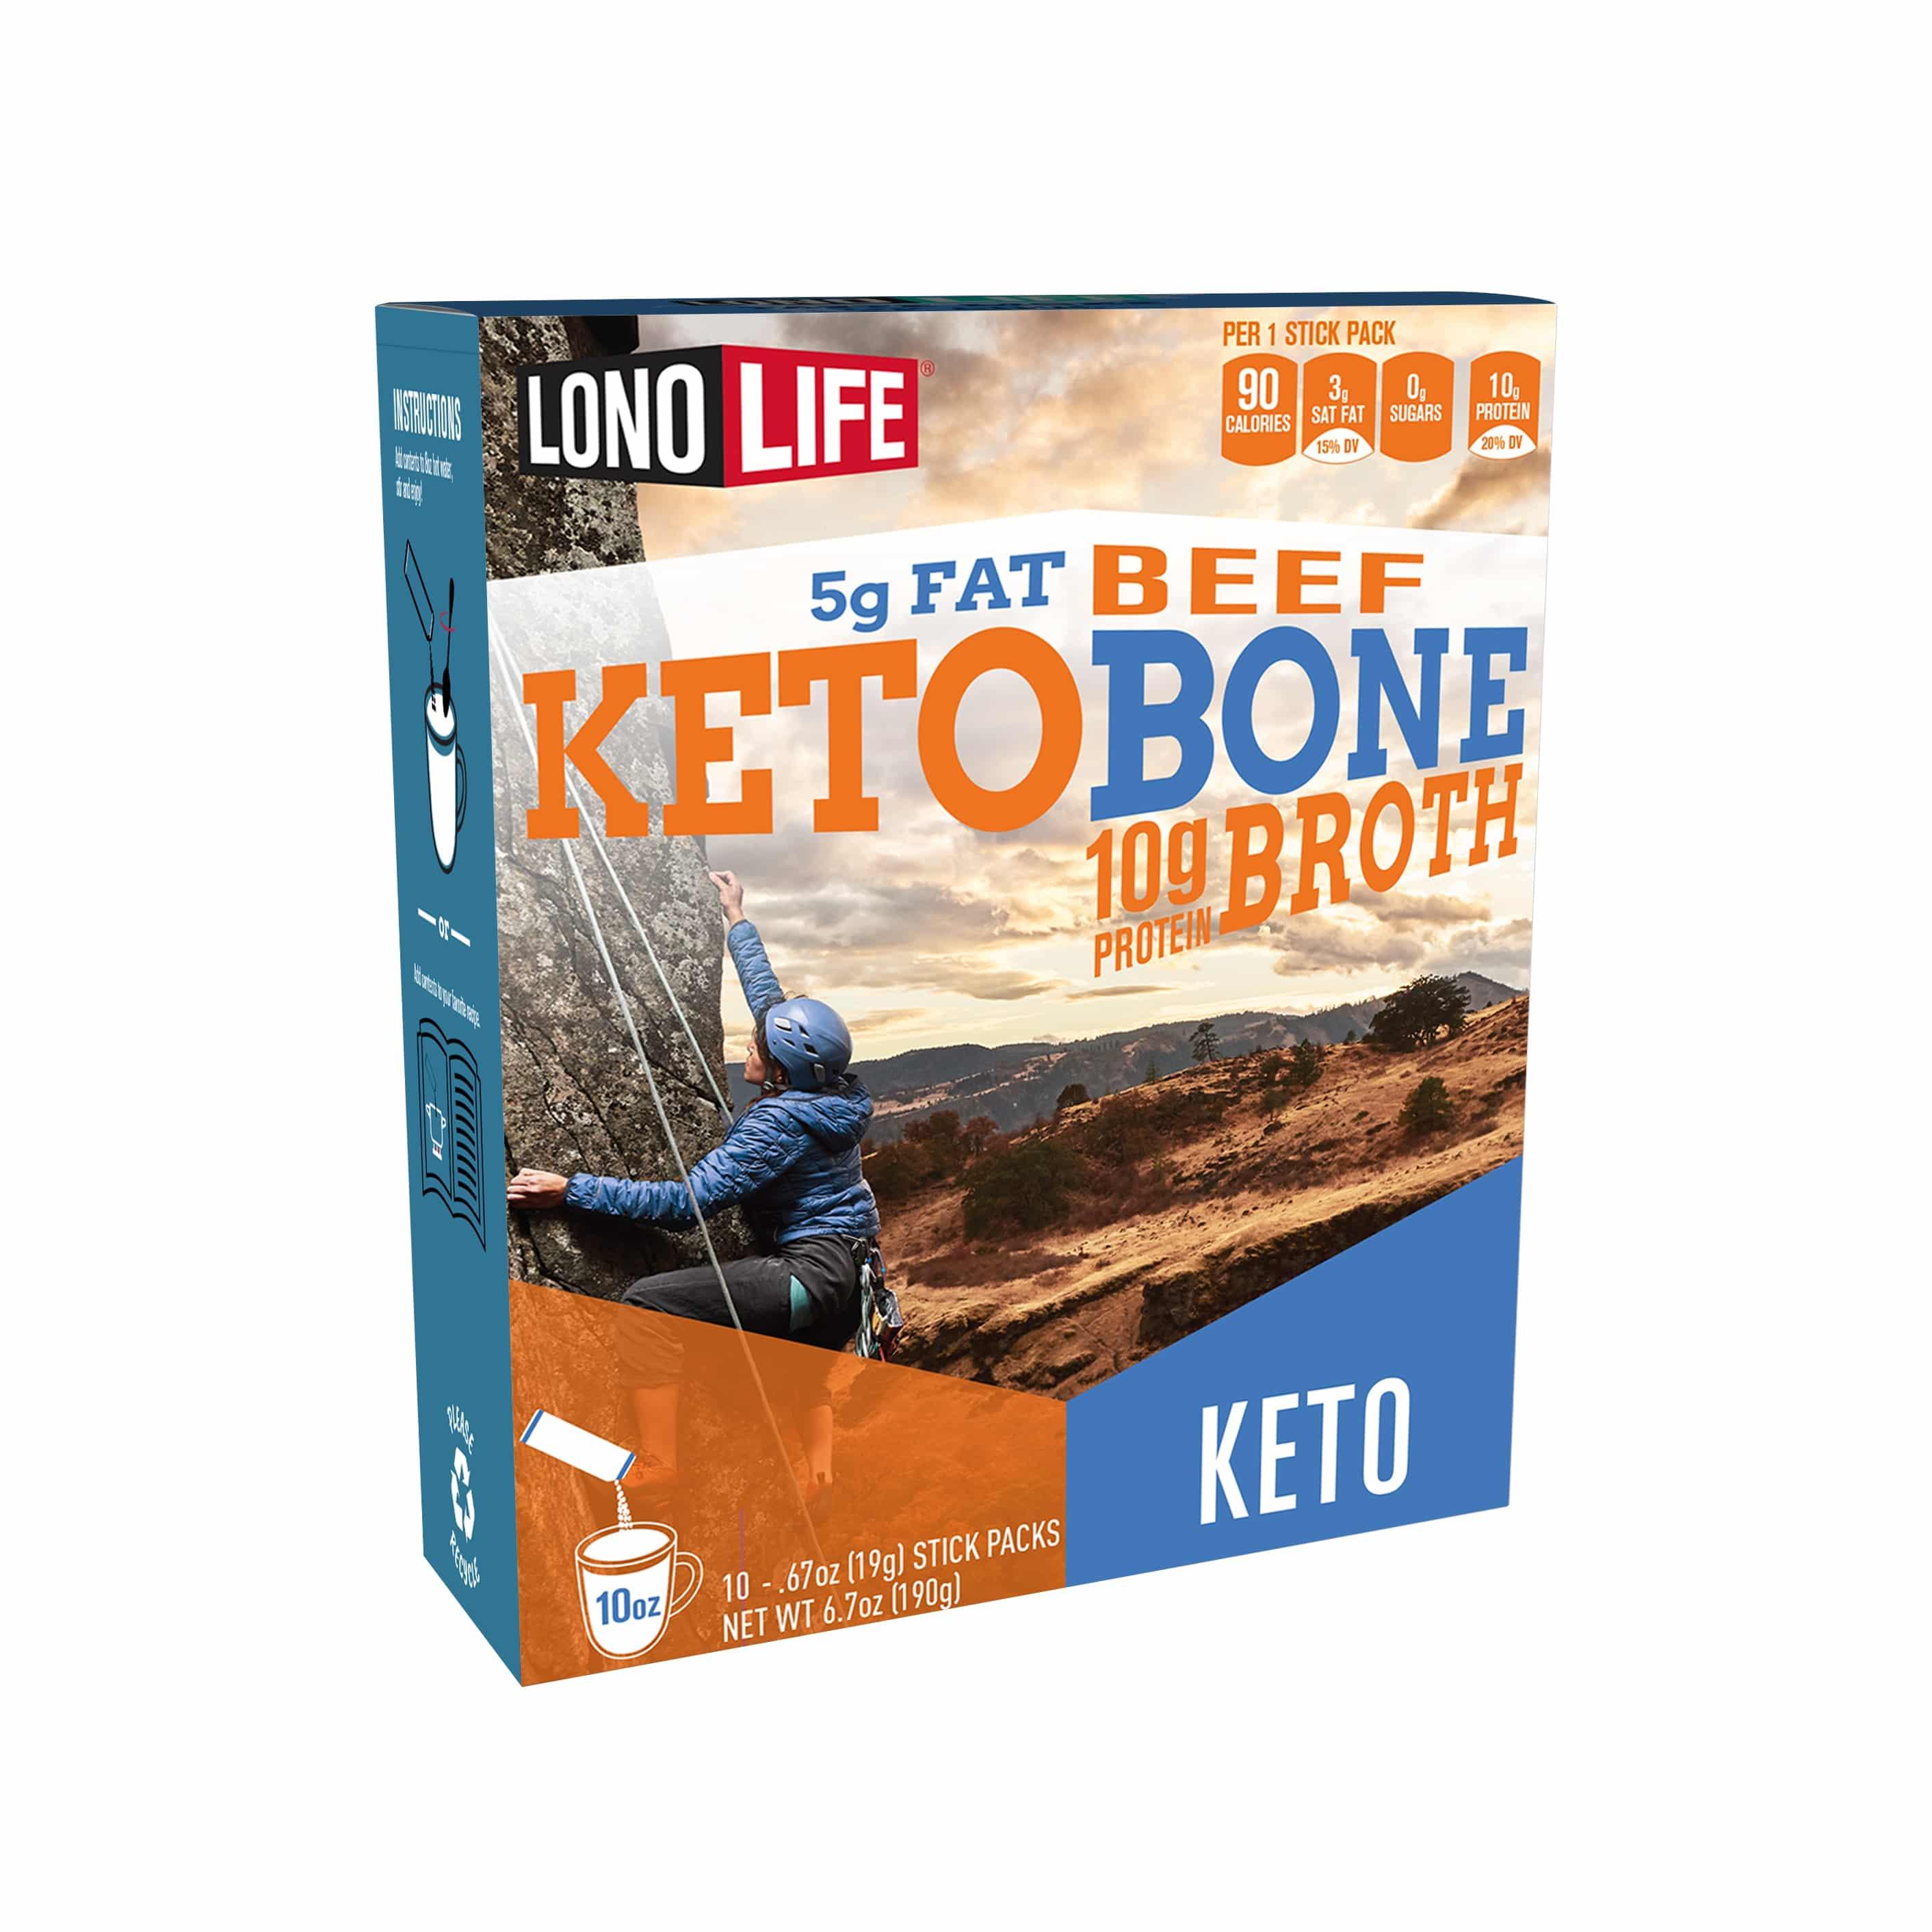 LonoLife Launches Keto Beef Bone Broth